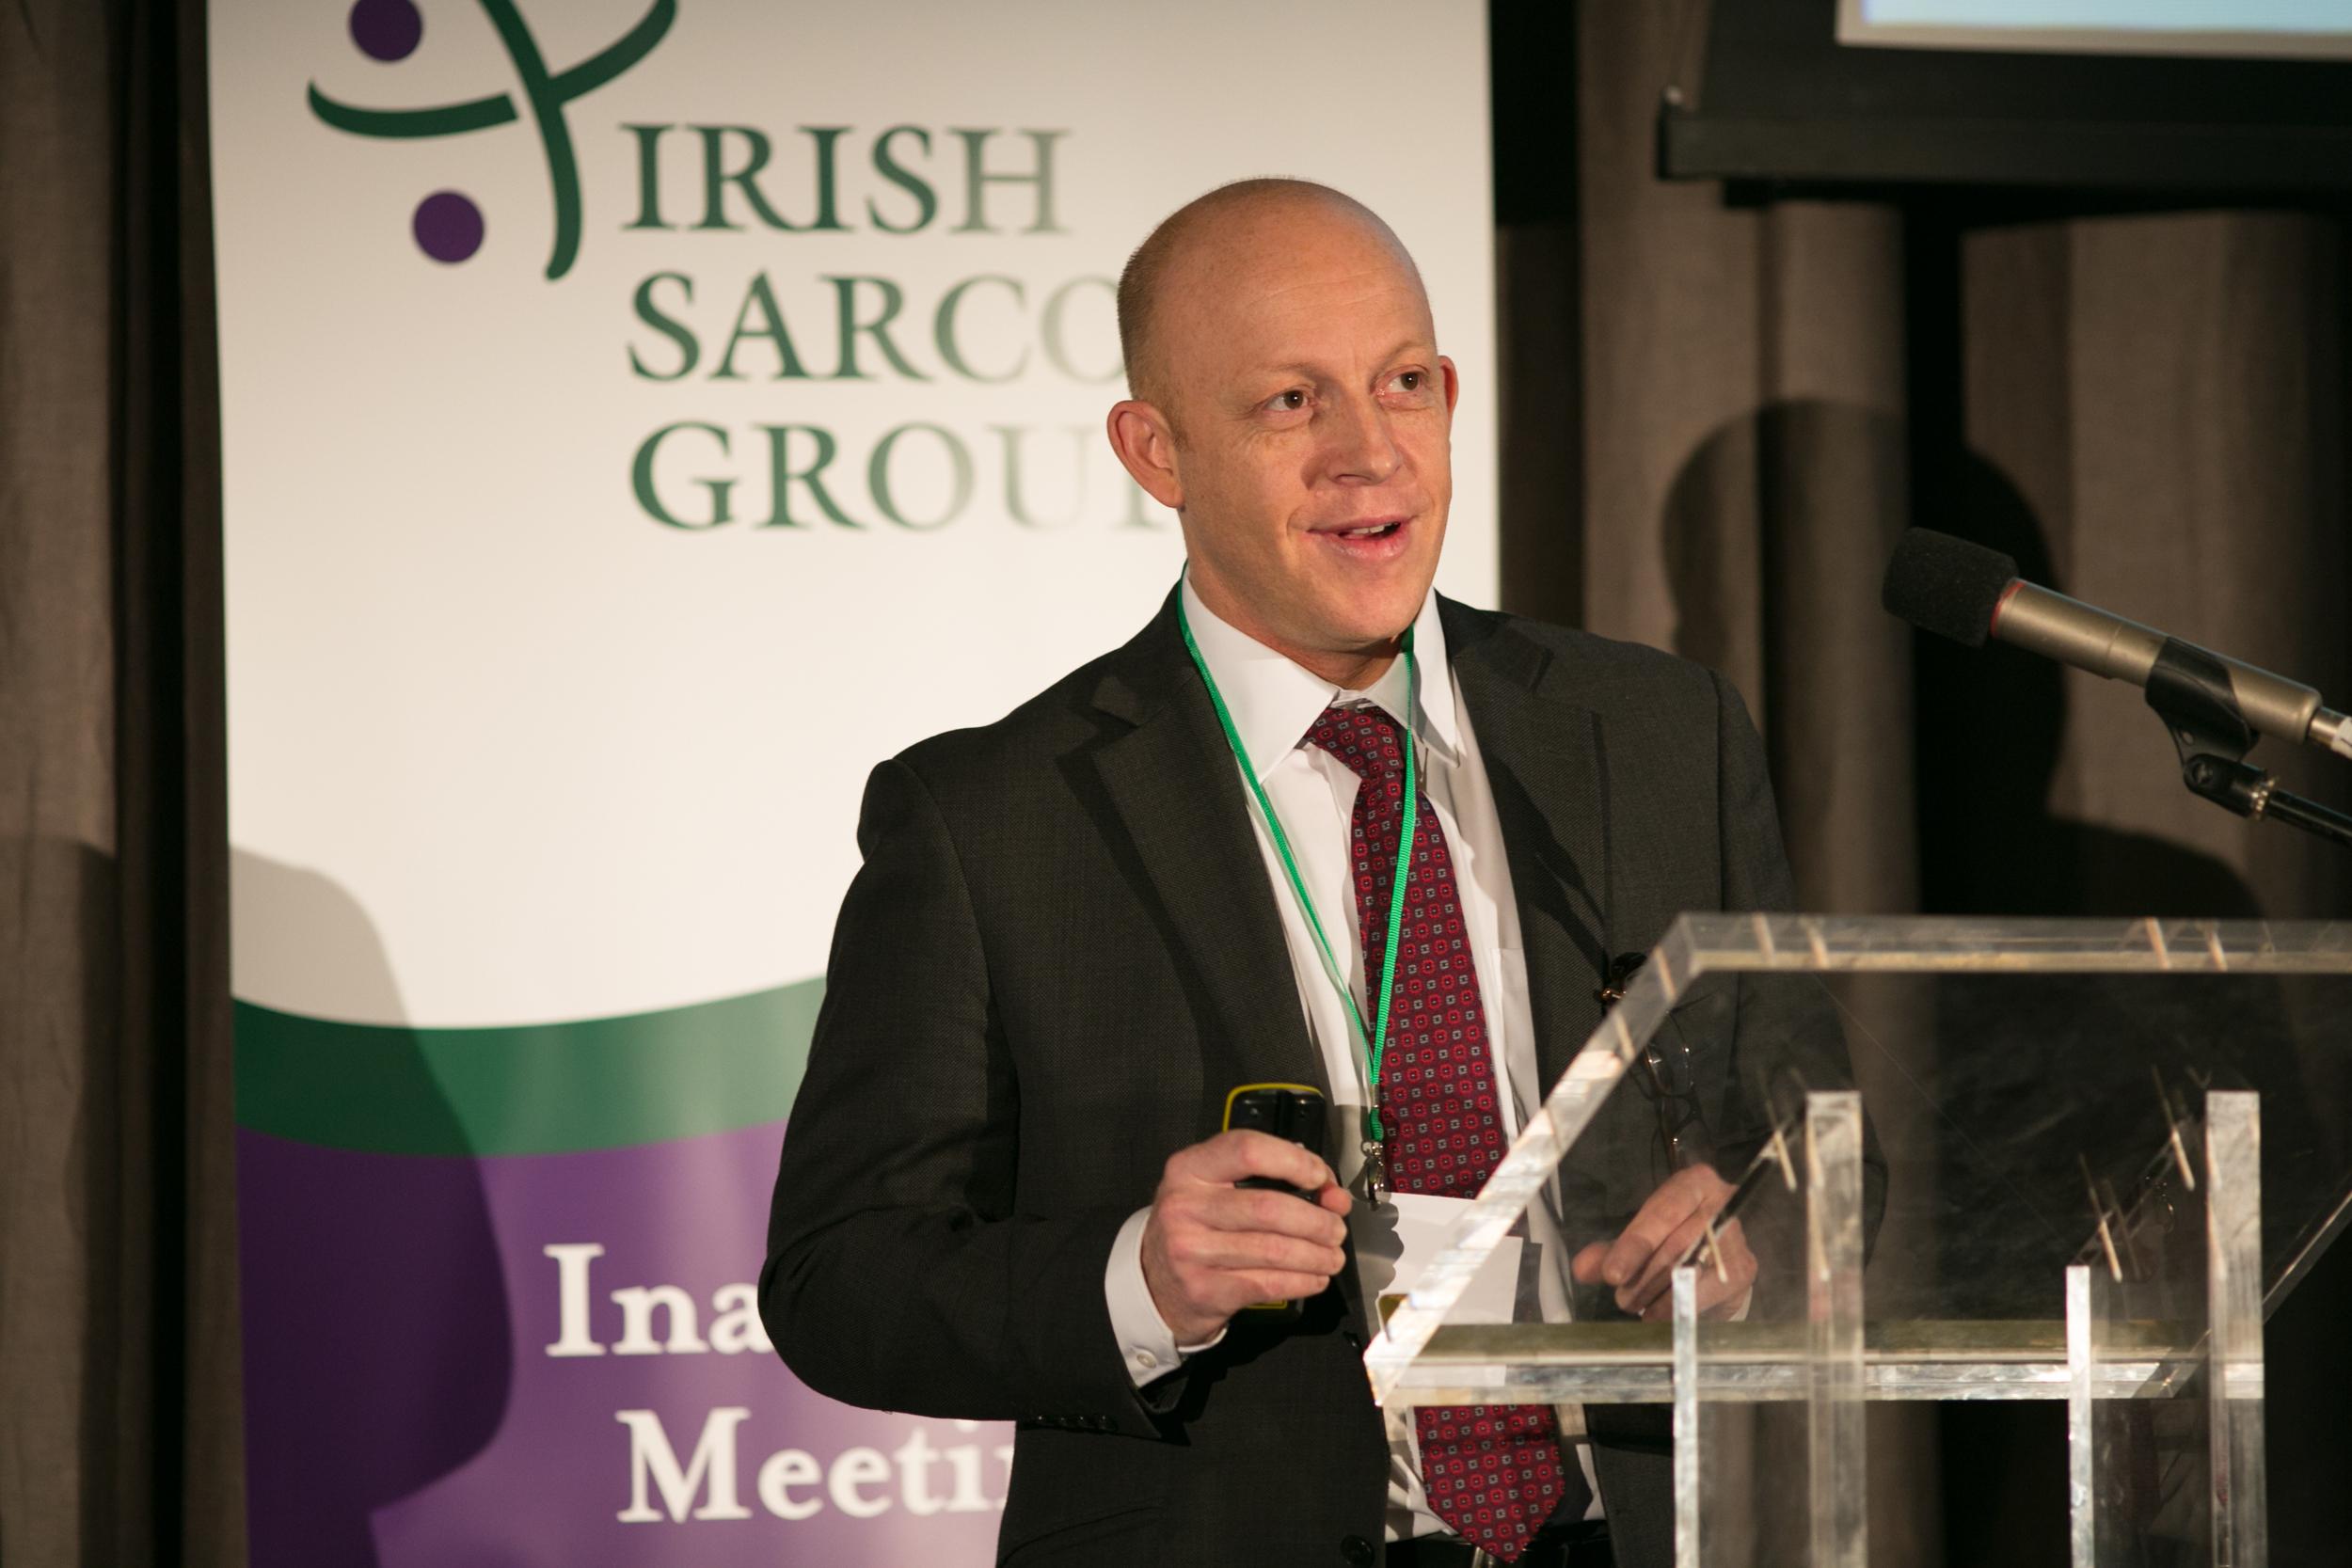 Dr Charles Gillham, Radiation Oncologist, St Luke's Radiation Oncology Network.